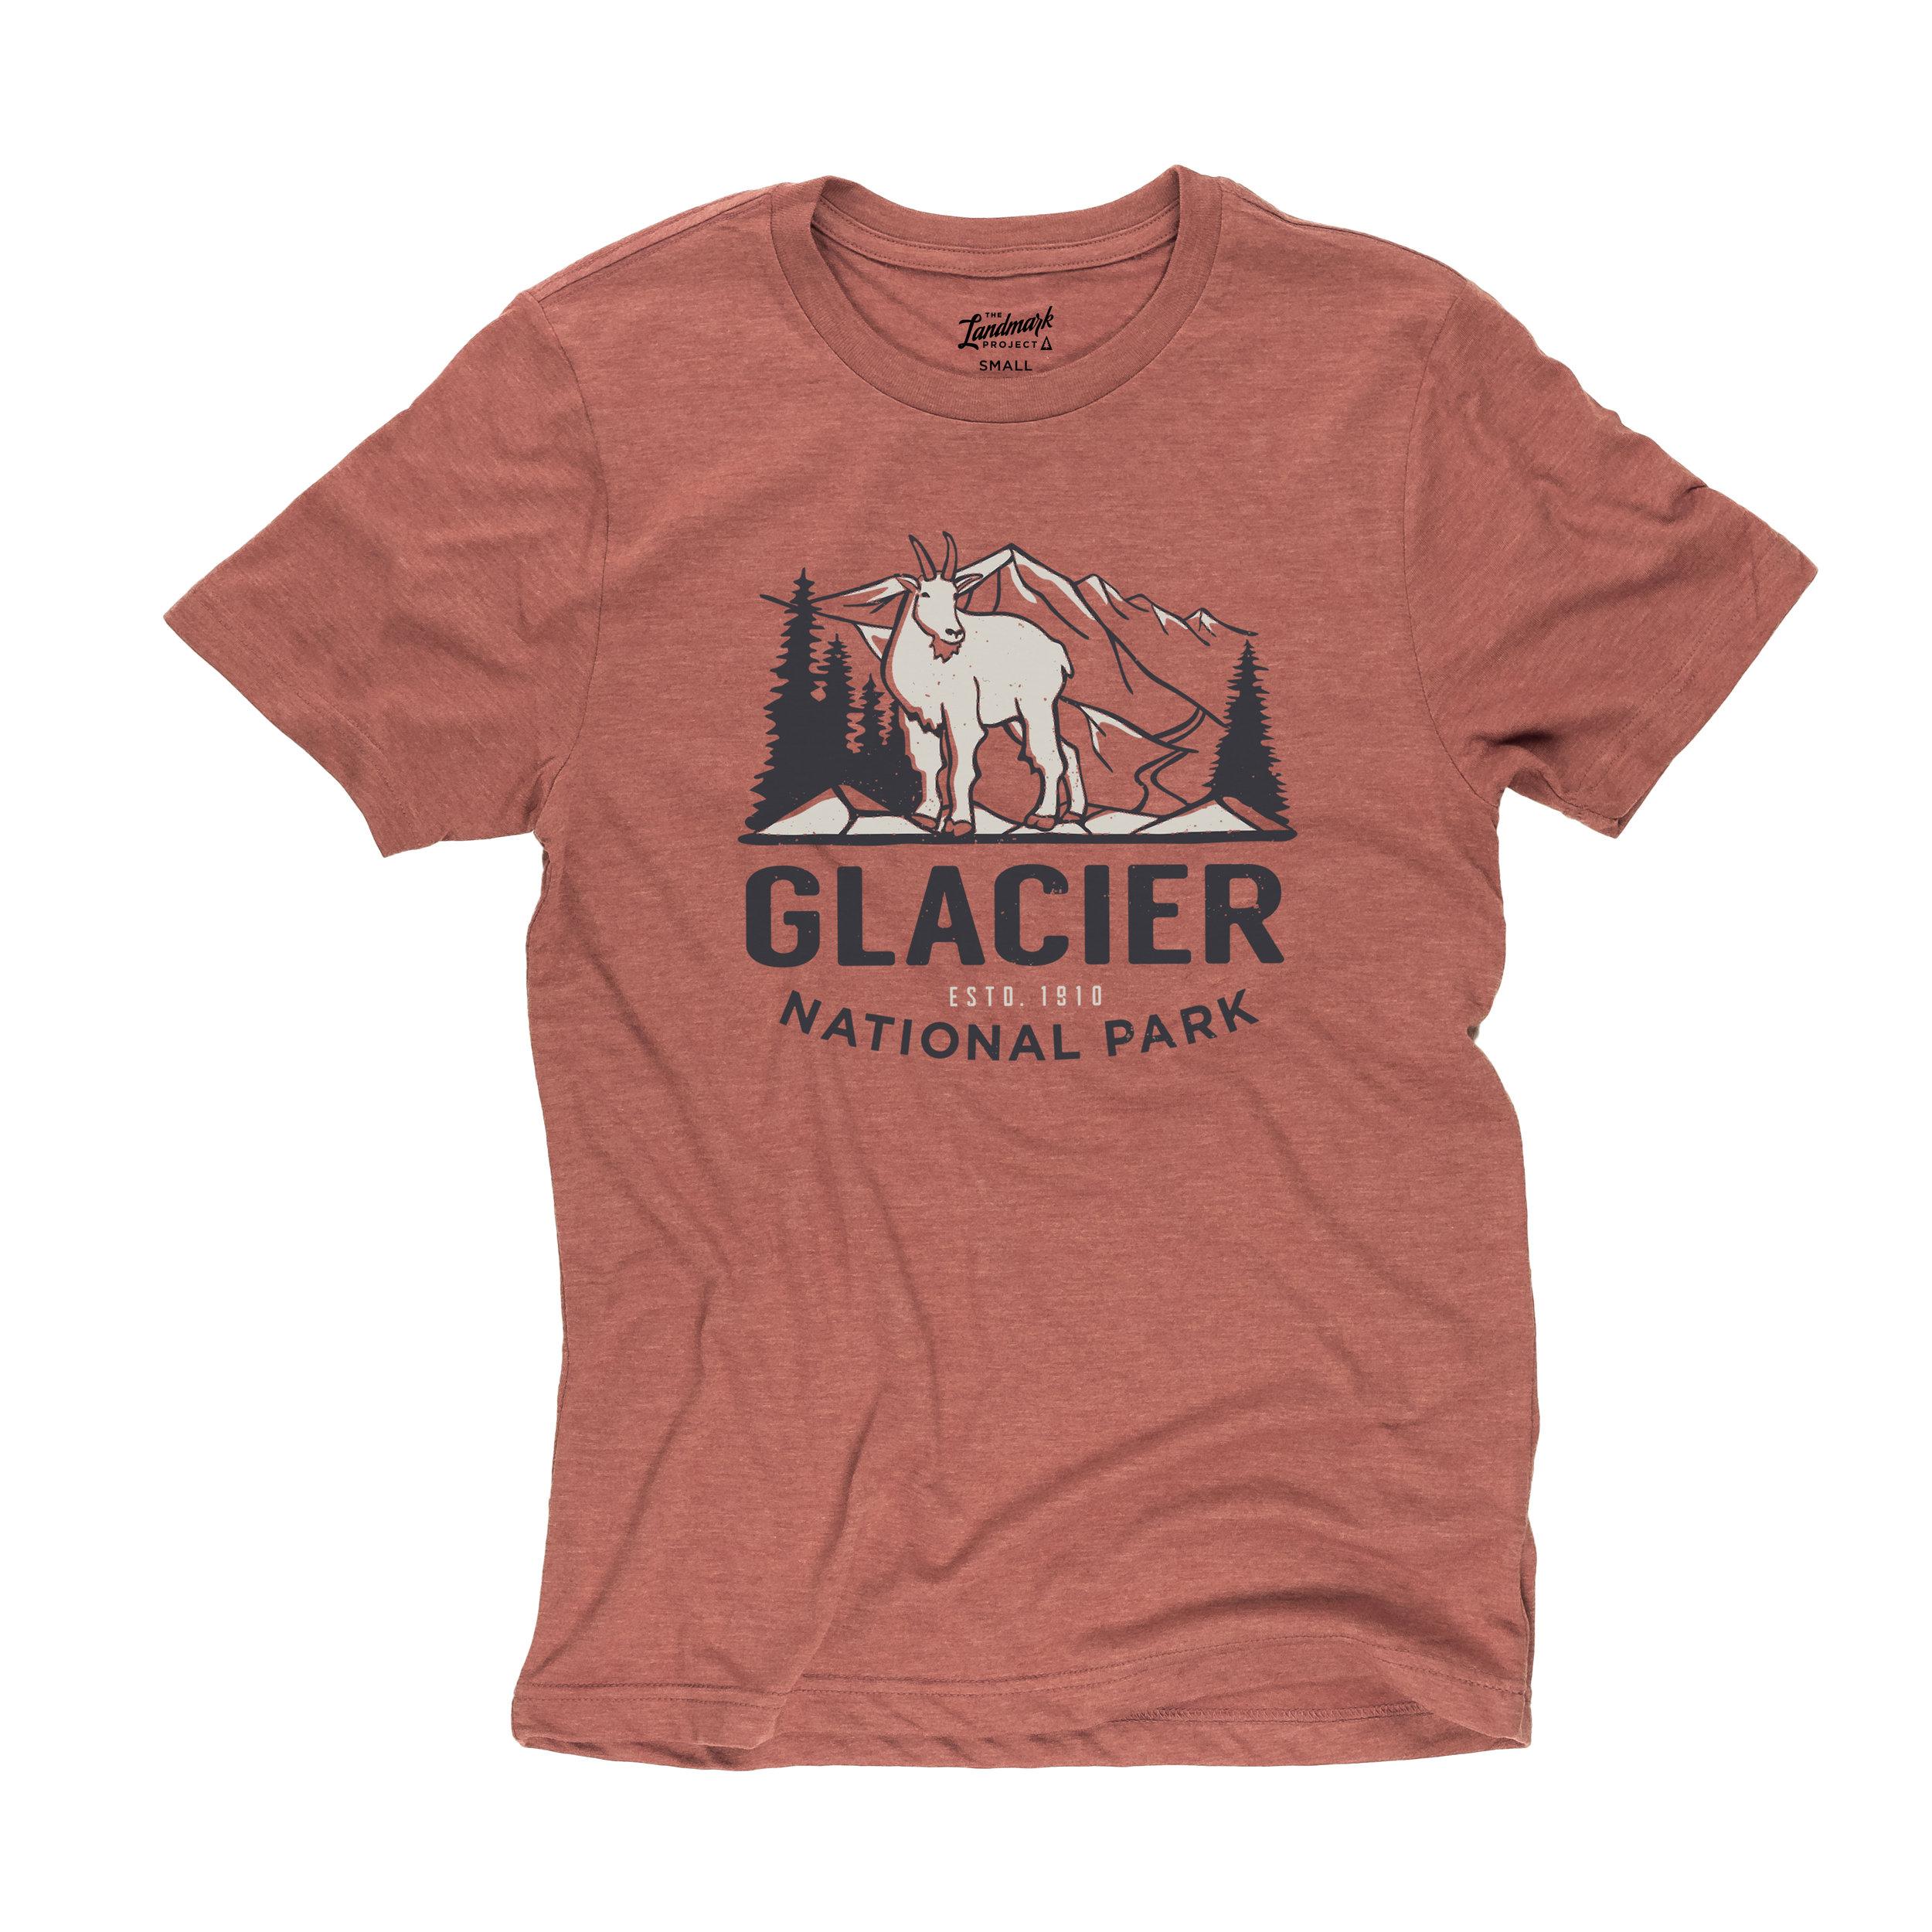 glacier-motif-redrocks-tee.jpg